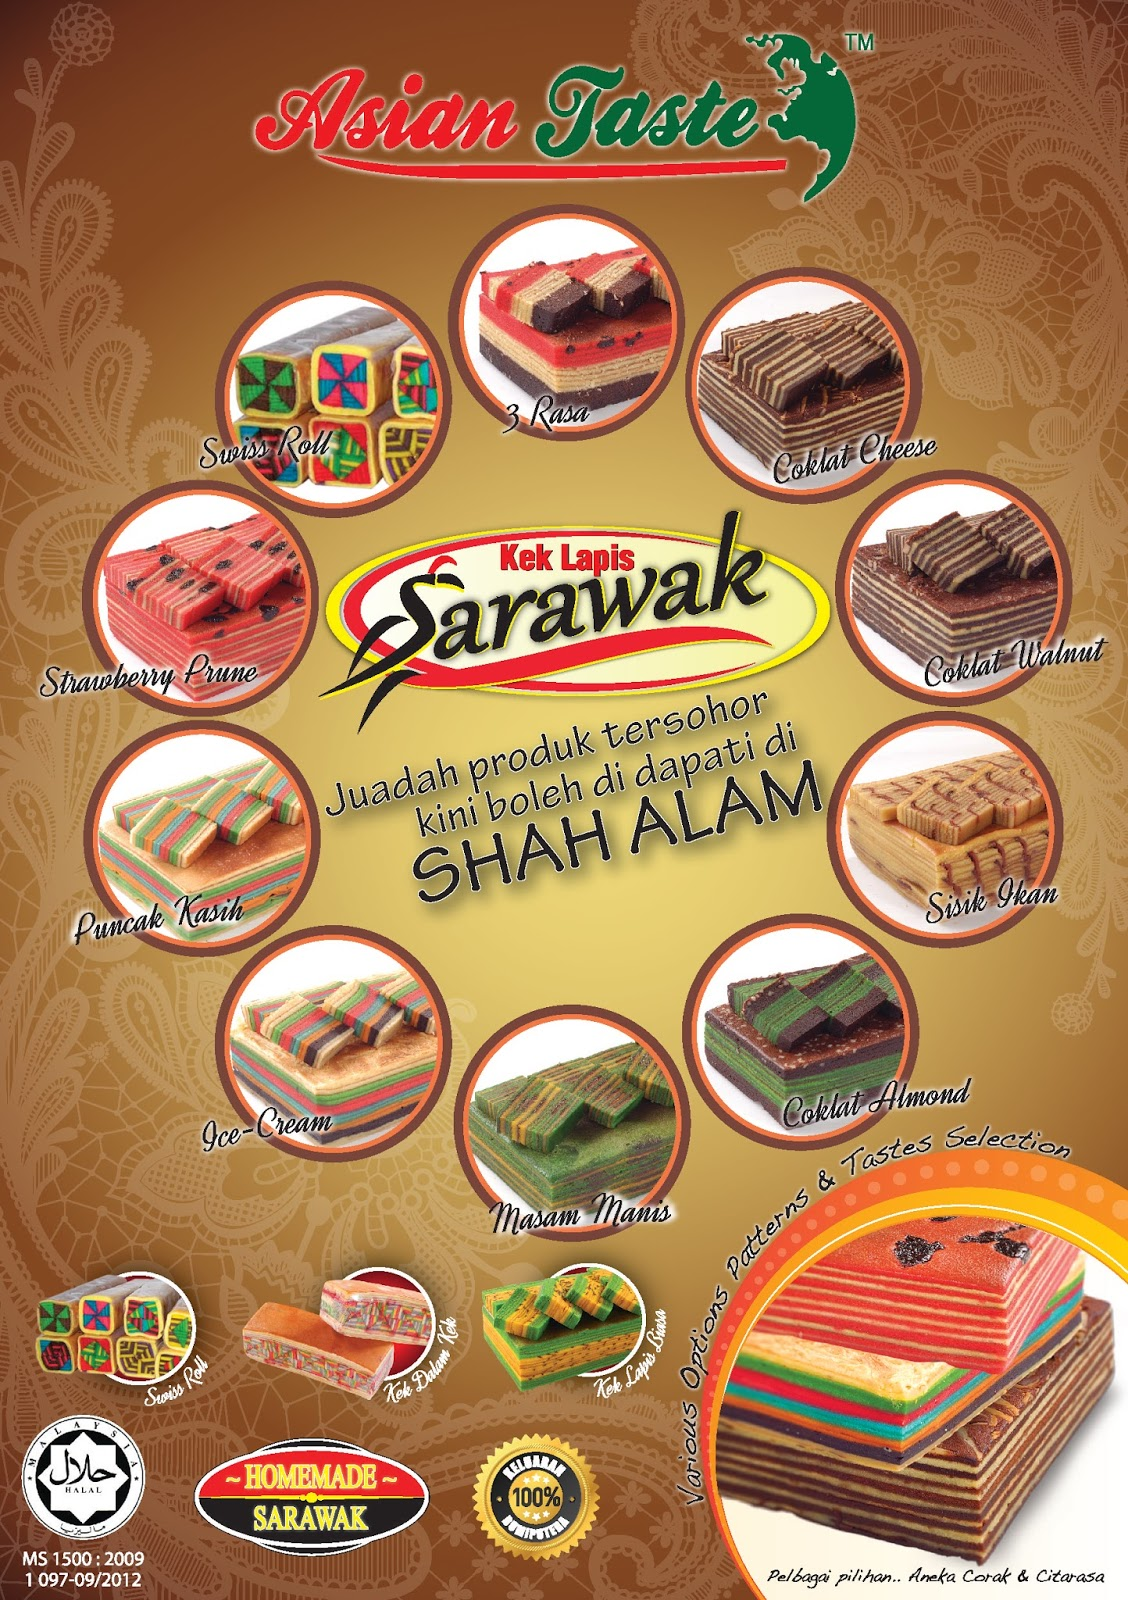 Bagi Yang Berminat Untuk Tambah Pendapatan Hubungi Kami Info Dan Cara Anda Boleh Menambah Income Dengan Kek Lapis Sarawak Asian Taste